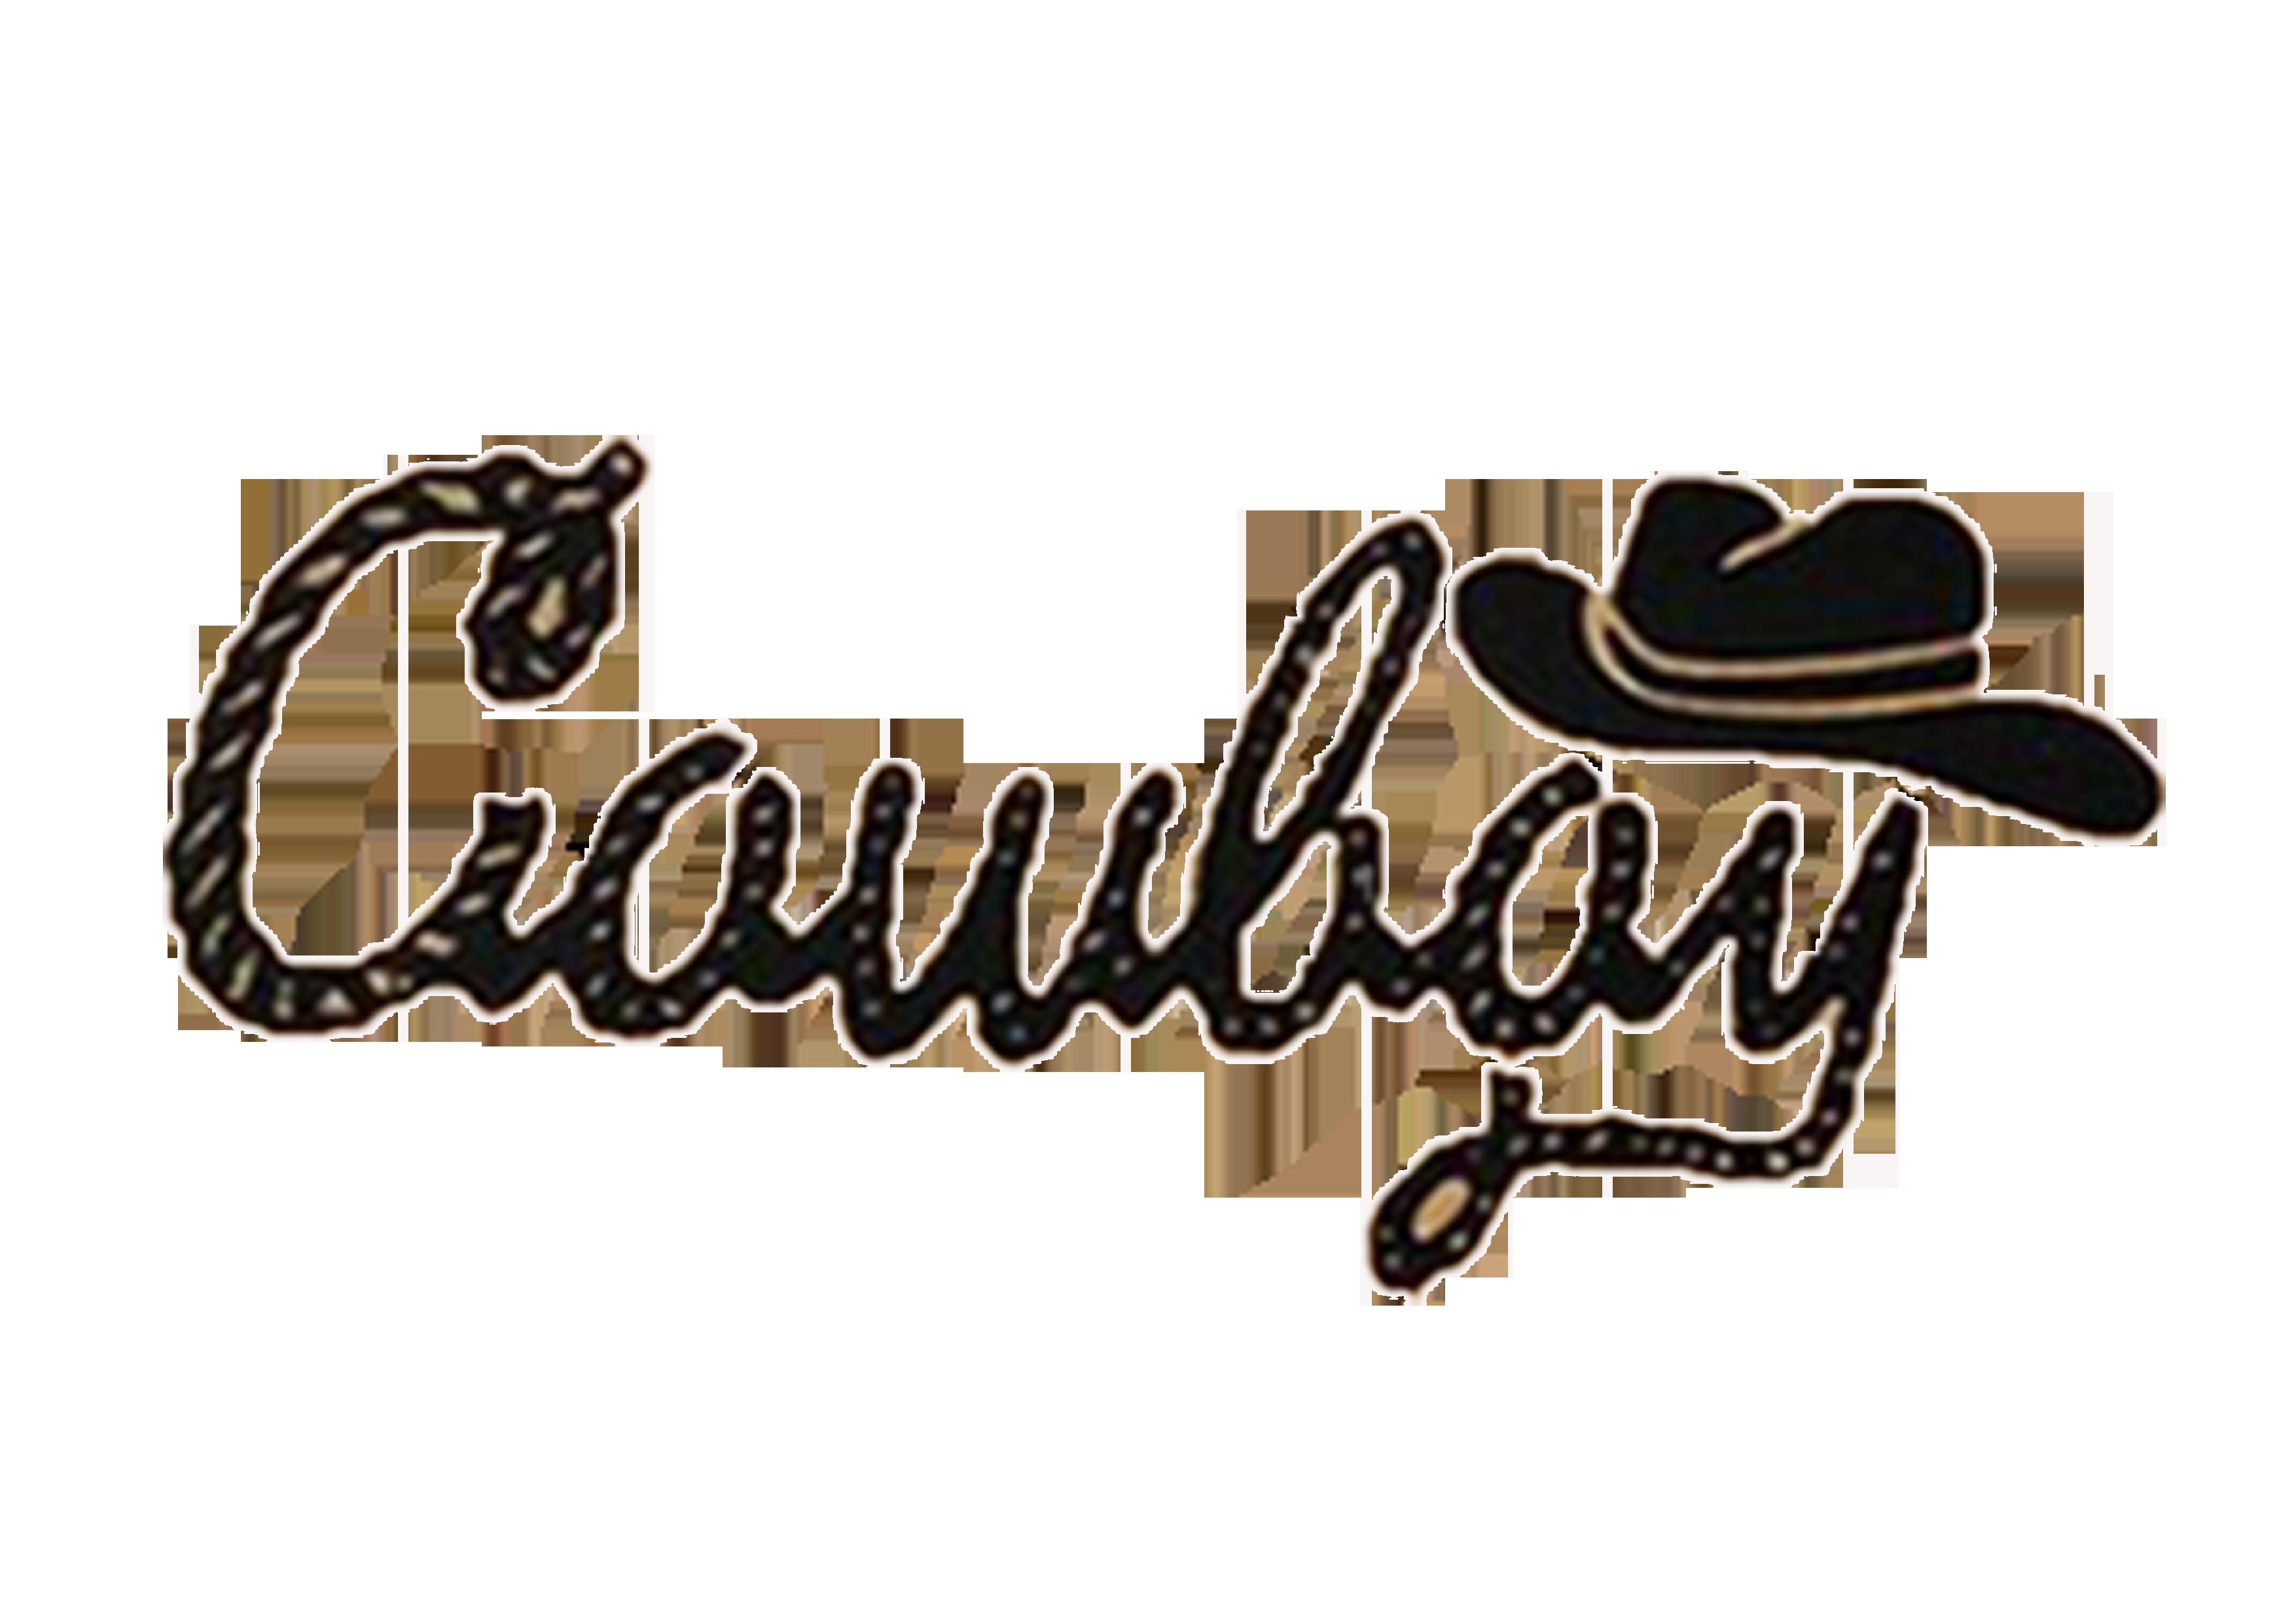 Cawbay